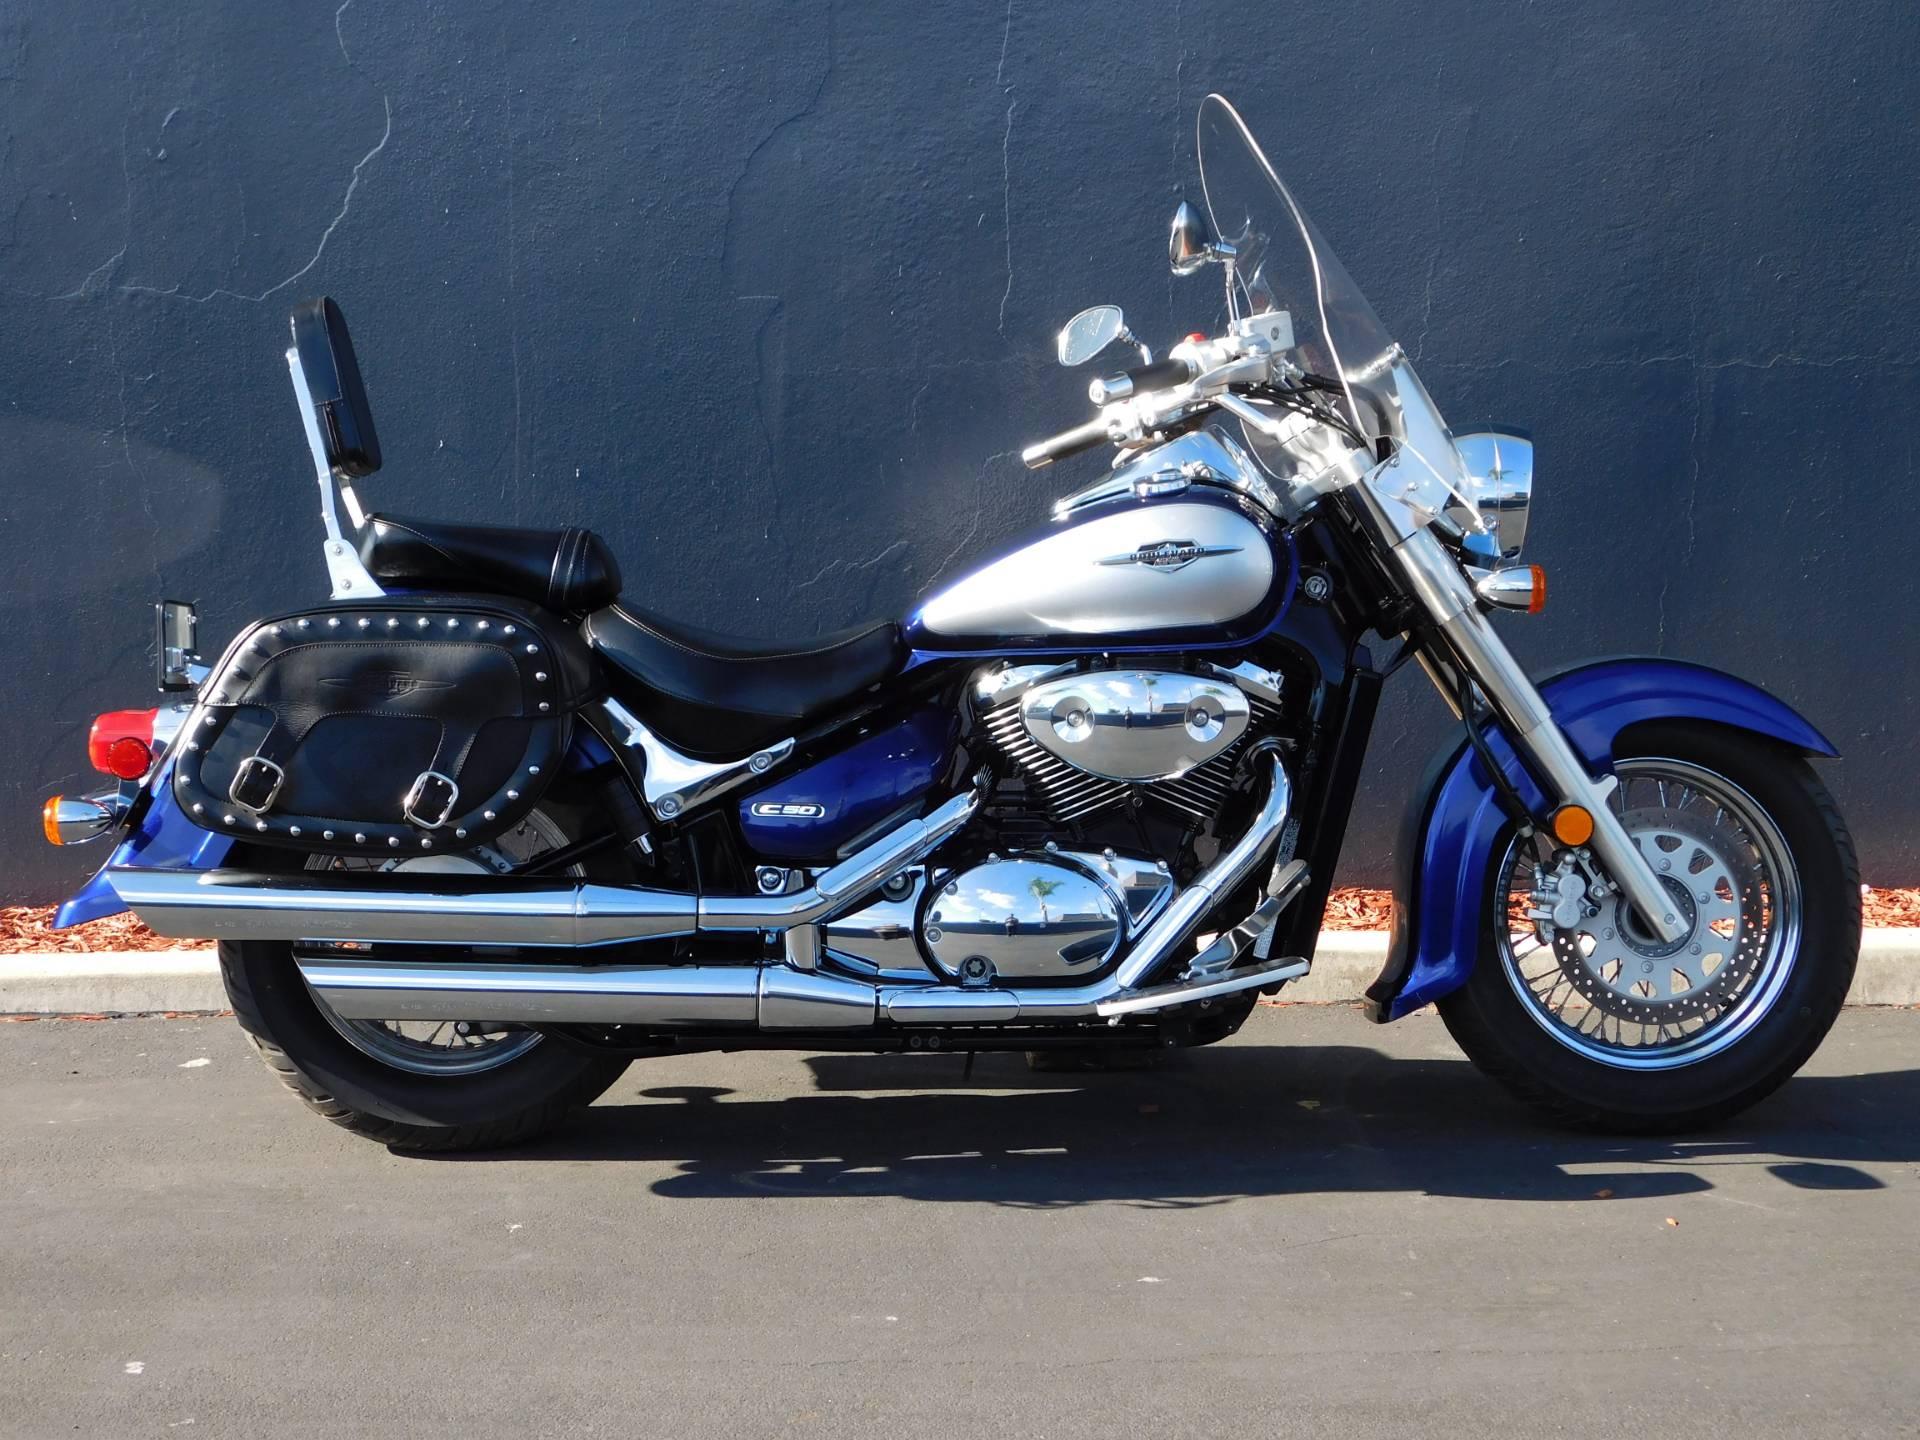 Used 2008 Suzuki Boulevard C50 Motorcycles in Chula Vista, CA ...